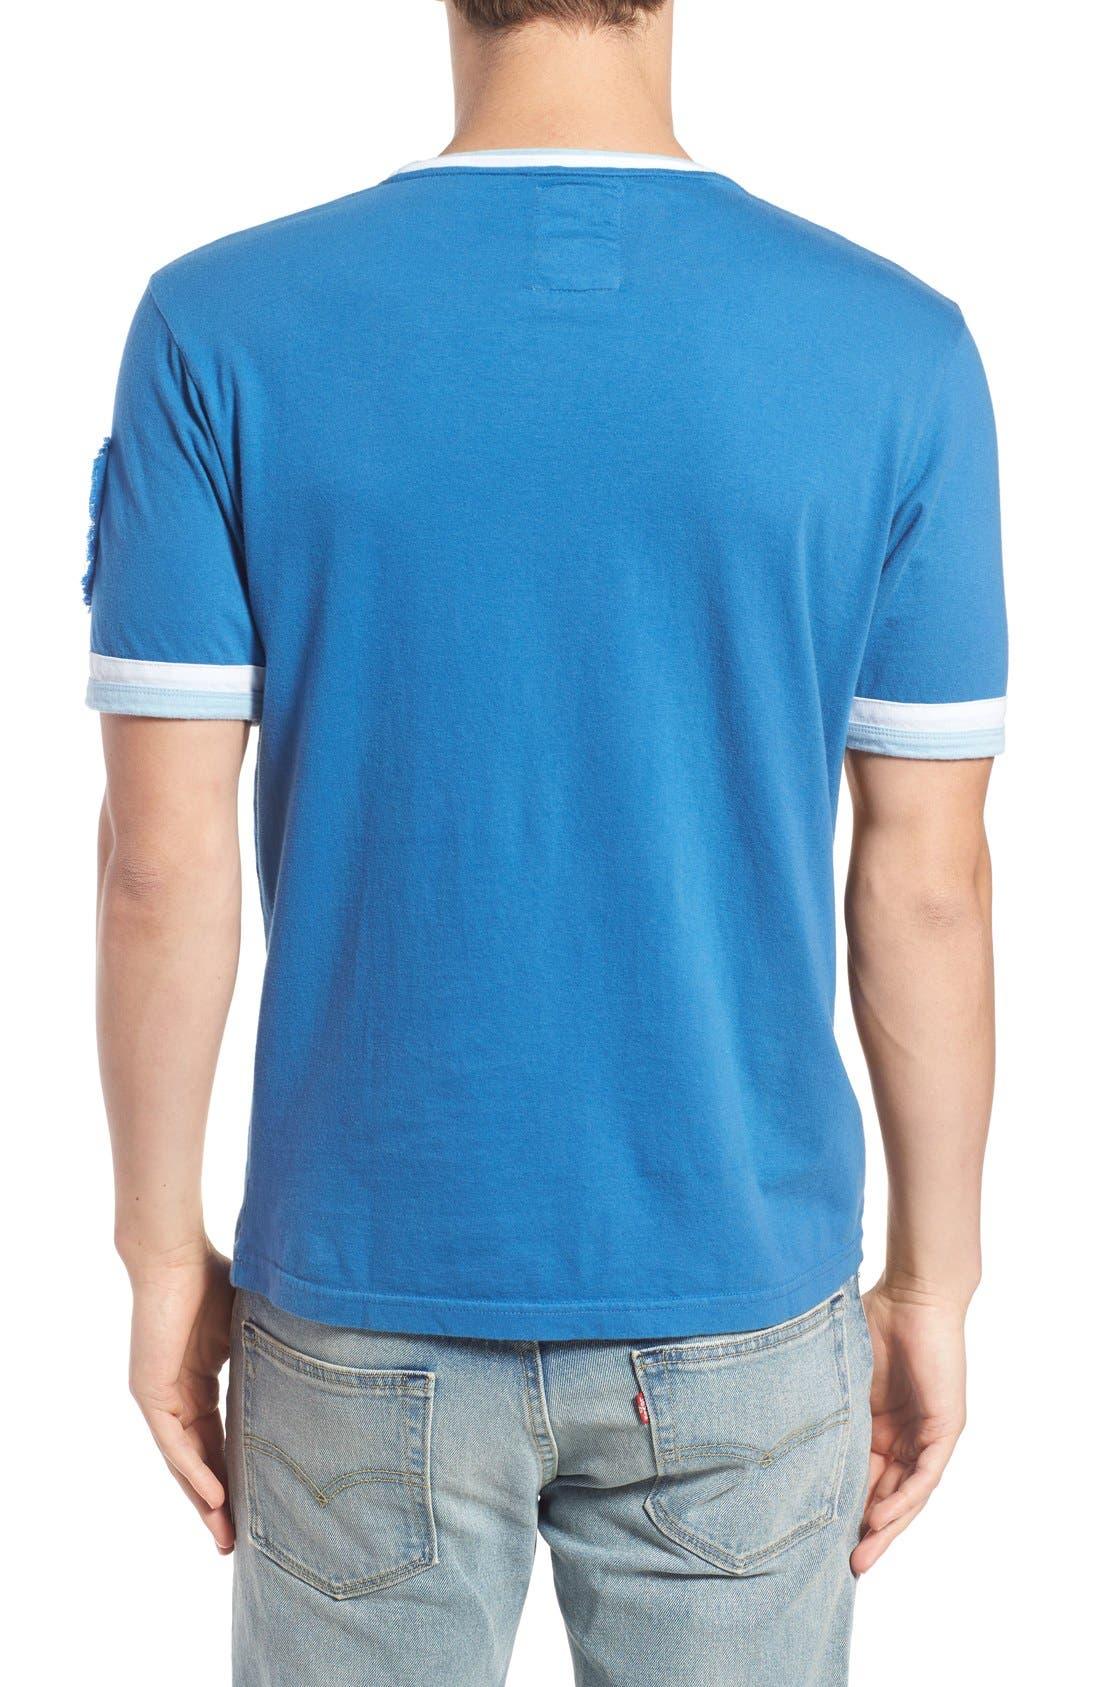 Alternate Image 2  - Red Jacket 'Kansas City Royals - Remote Control' Trim Fit T-Shirt